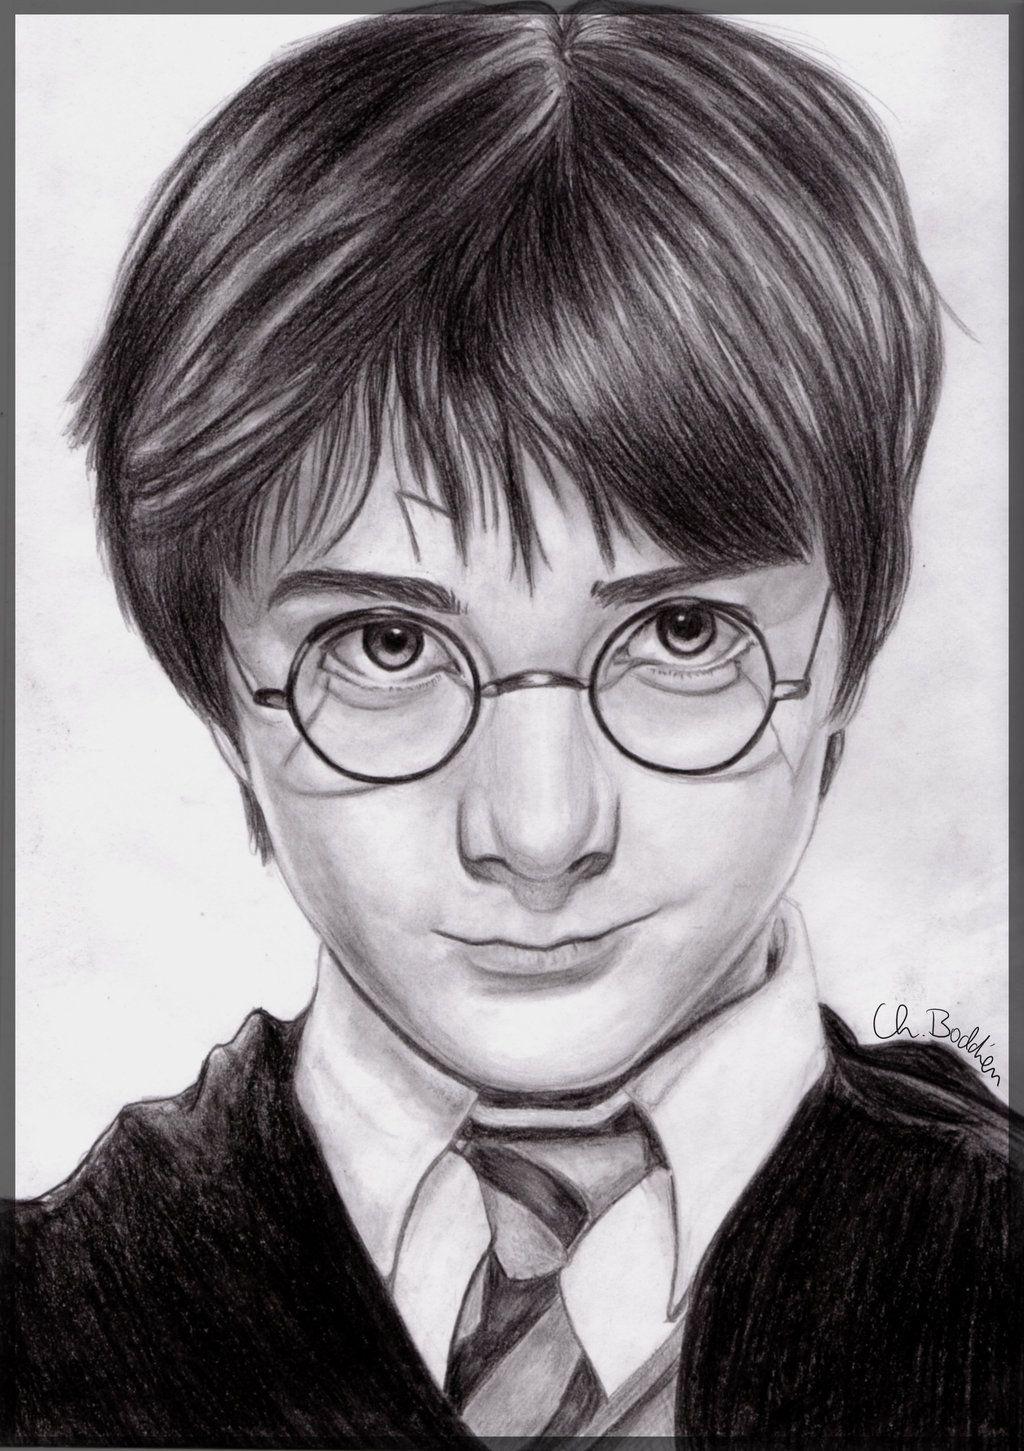 étonnant  Mot-Clé Little Harry Potter by Flubberwurm on deviantART   Harry potter ...